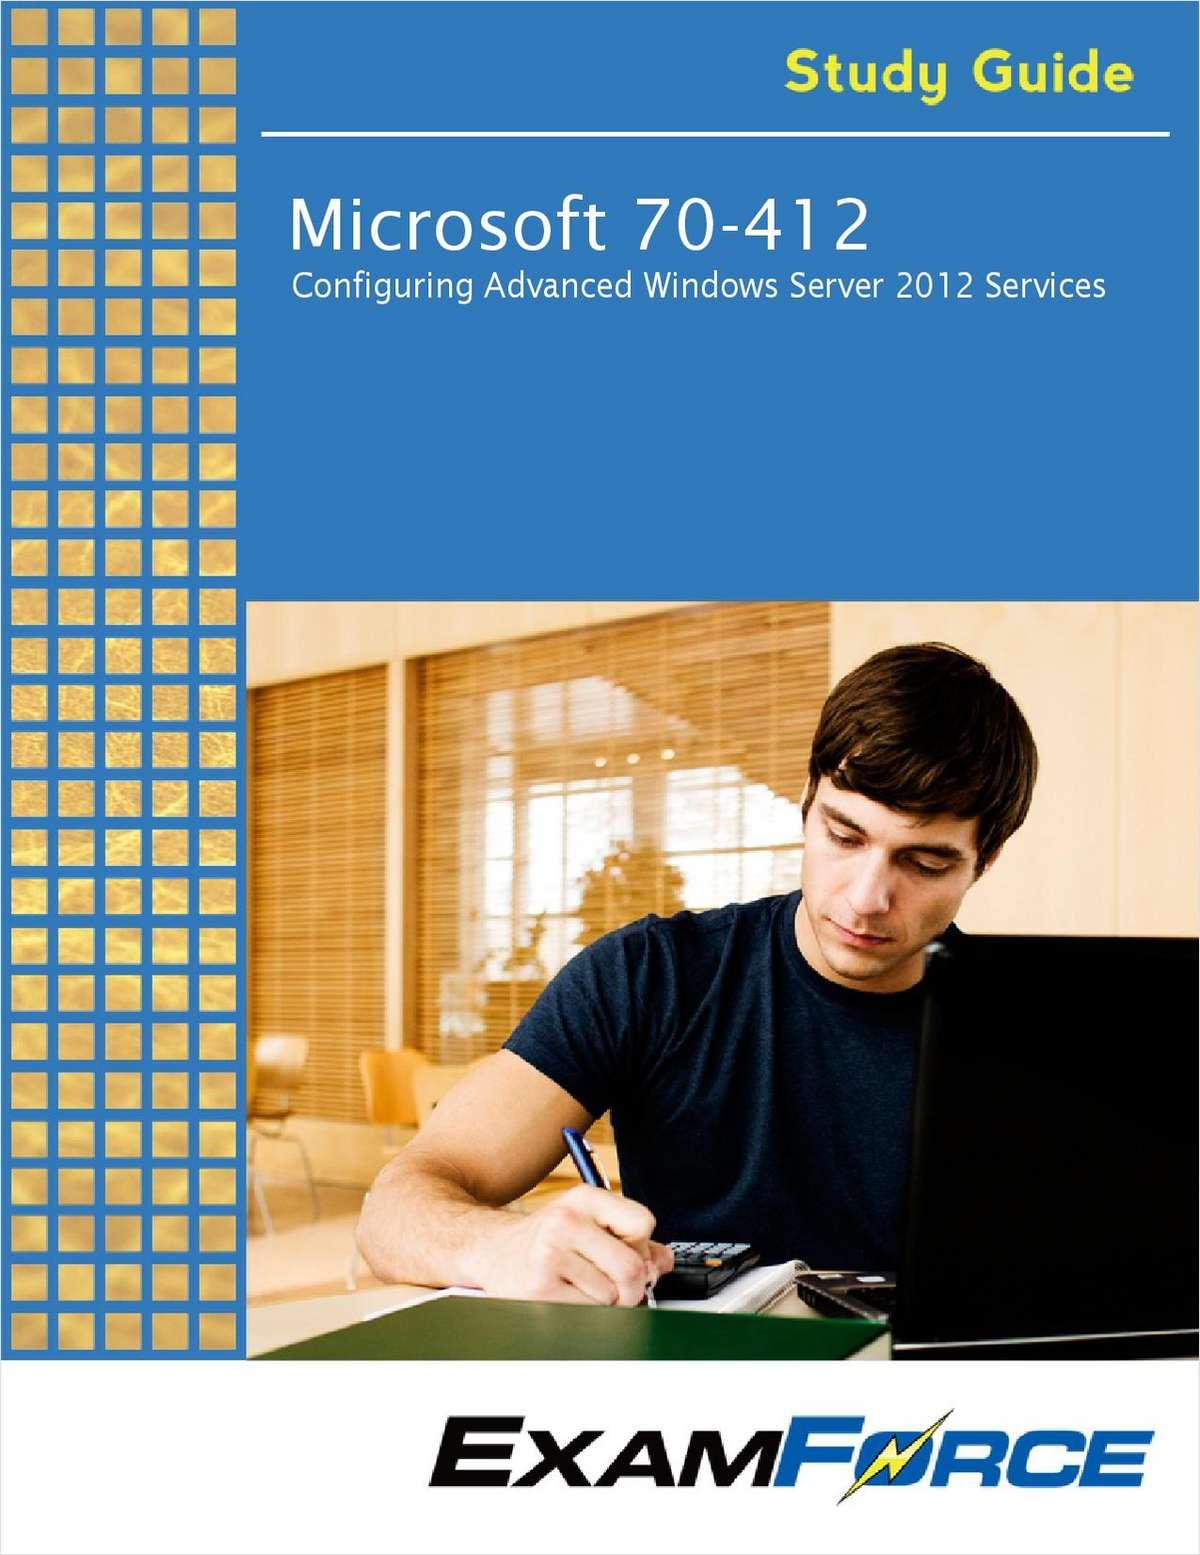 Microsoft 70-412: Configuring Advanced Windows Server 2012 (FREE Study Guide)